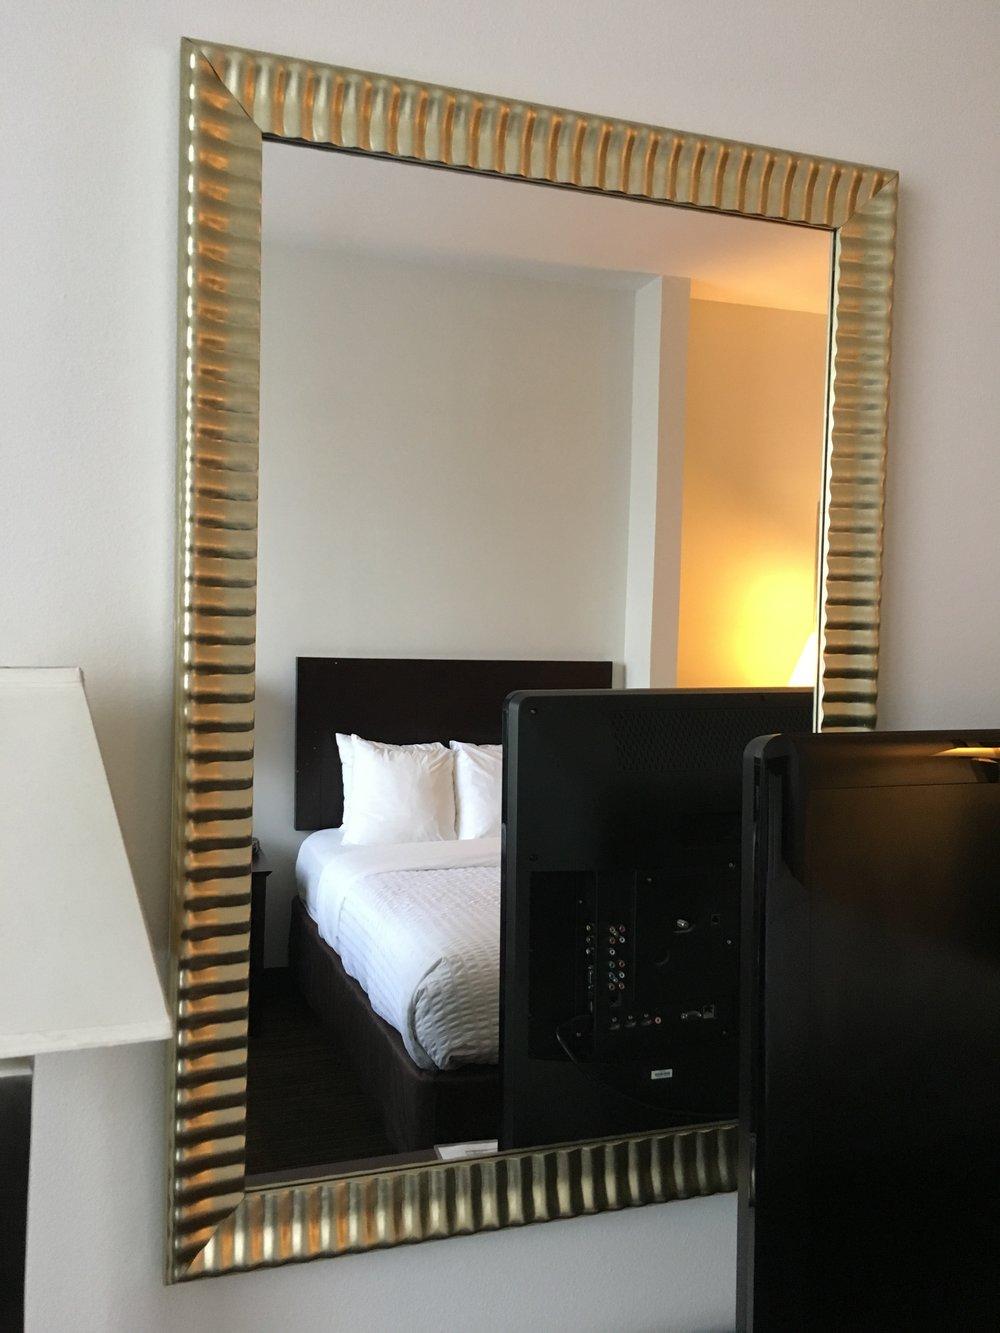 GB Vanity Mirror $35